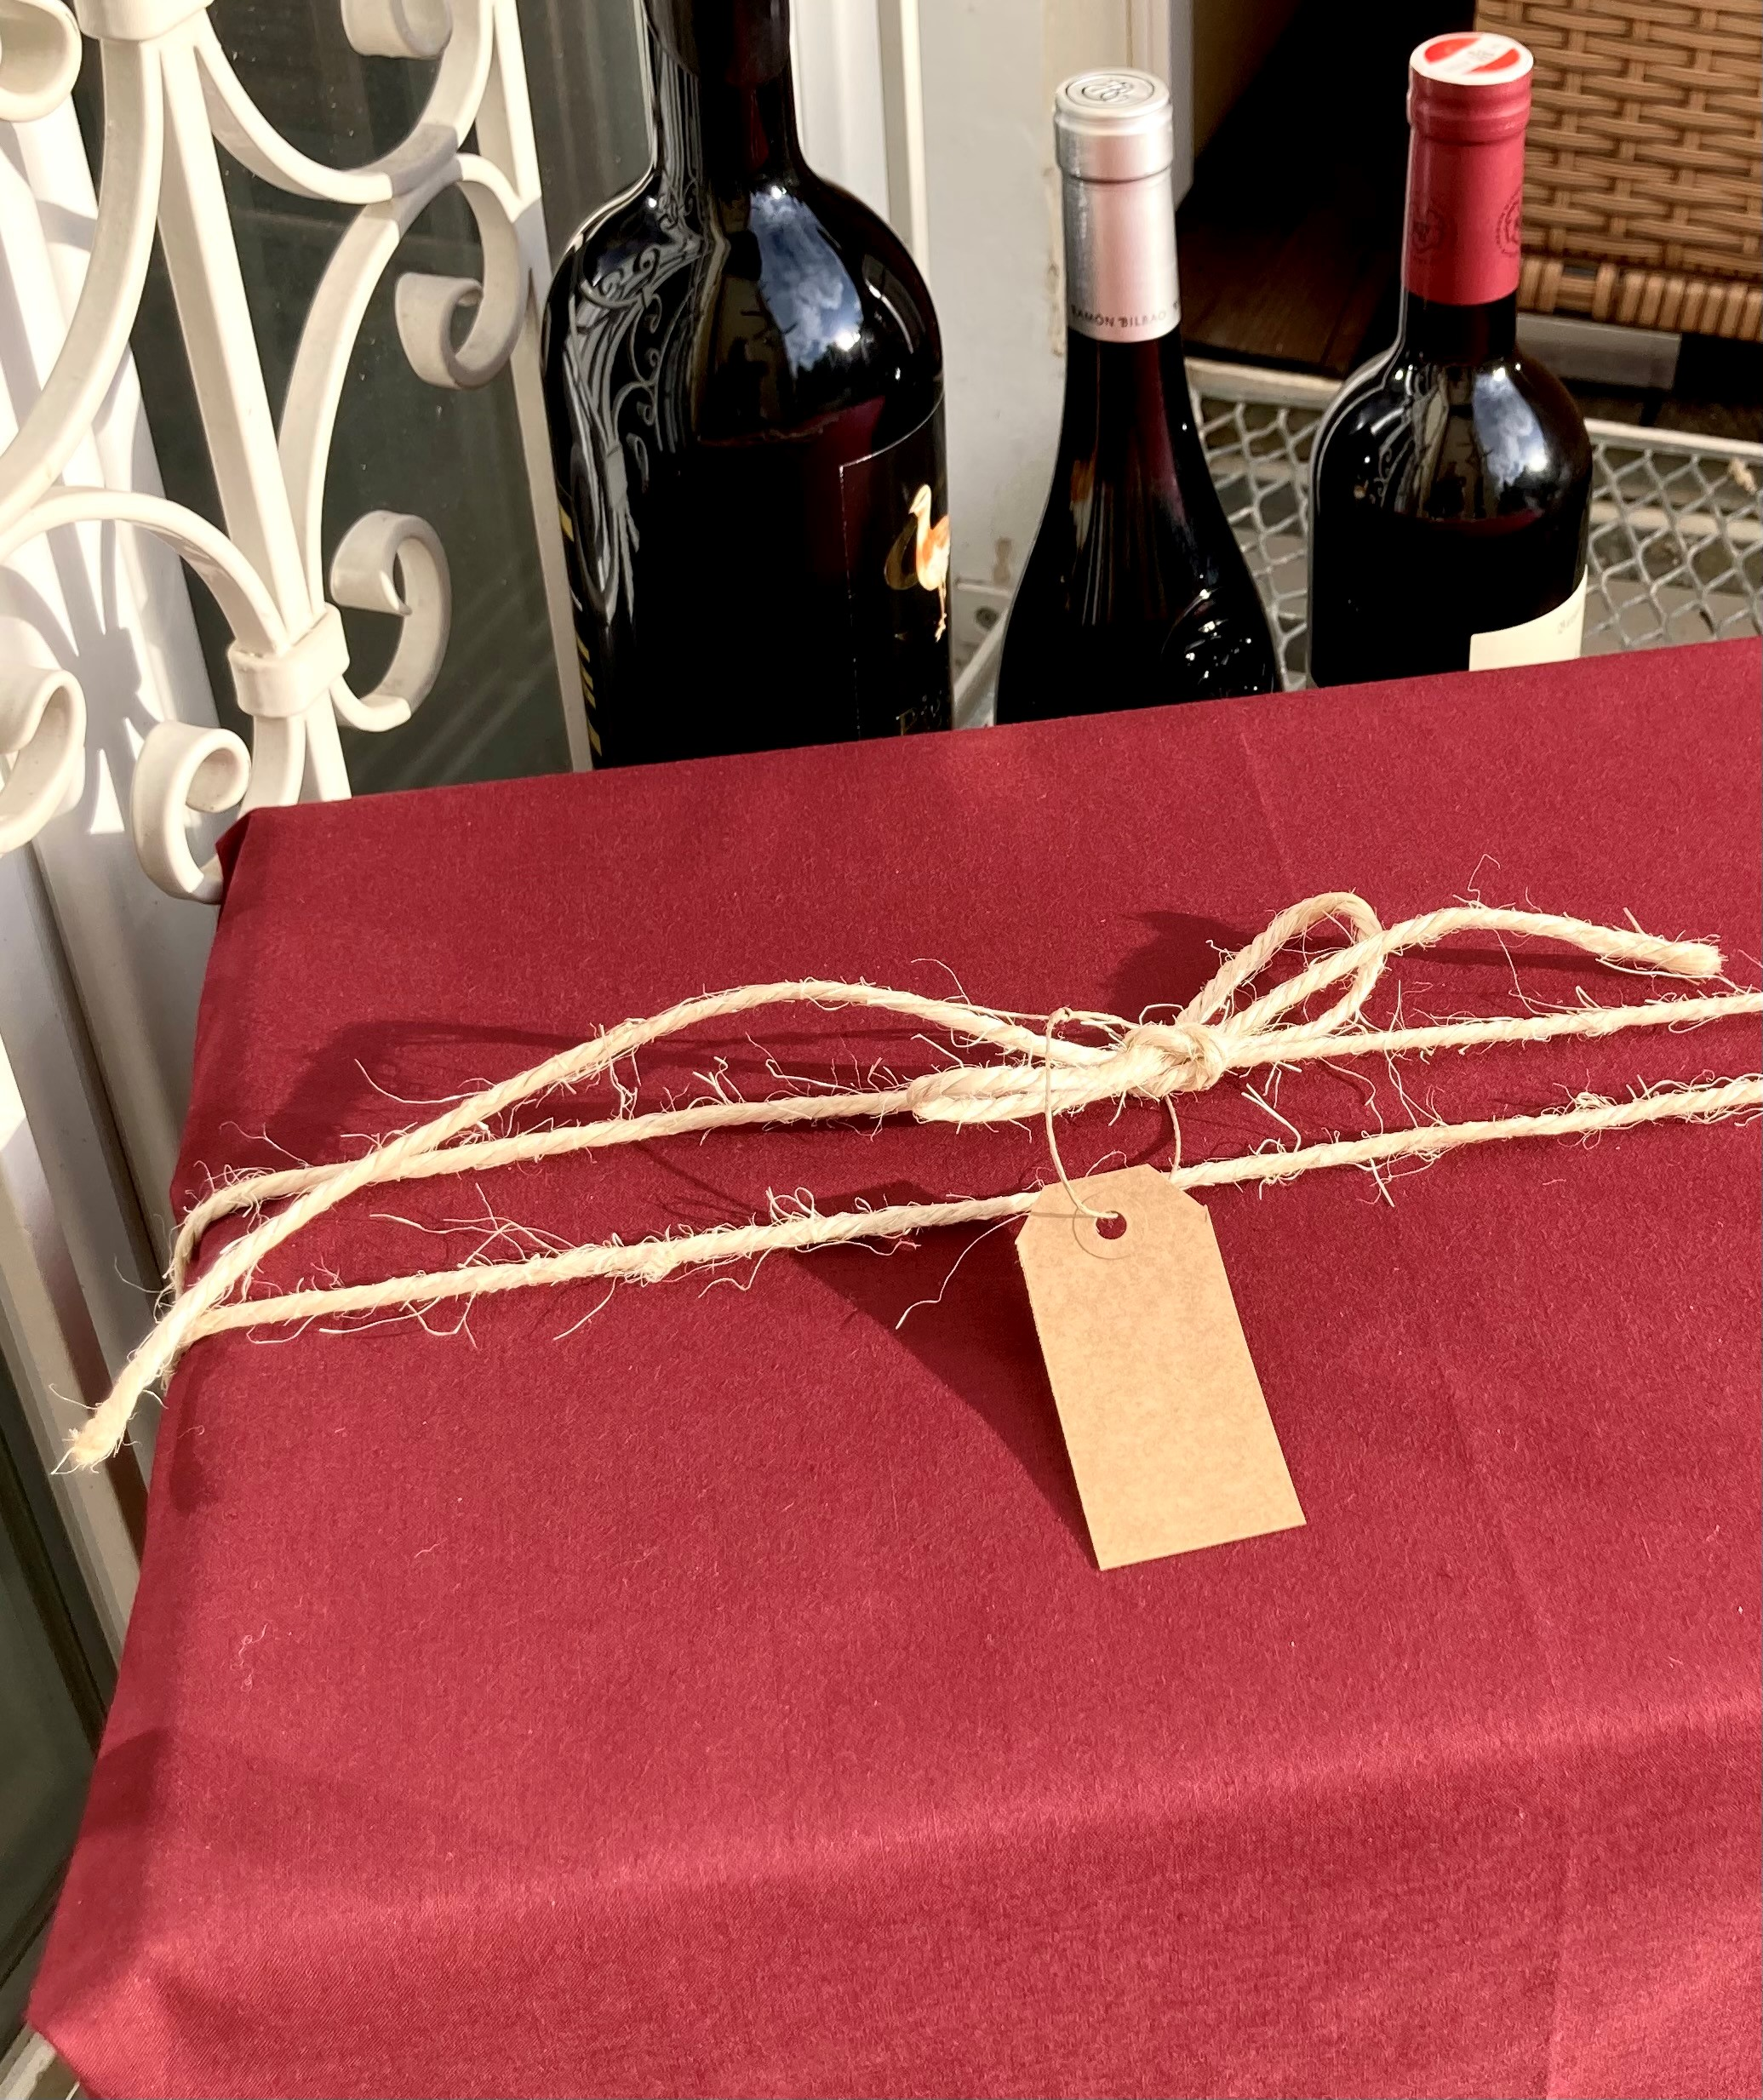 Einfach Her mit dem Bordeaux (100x80cm)